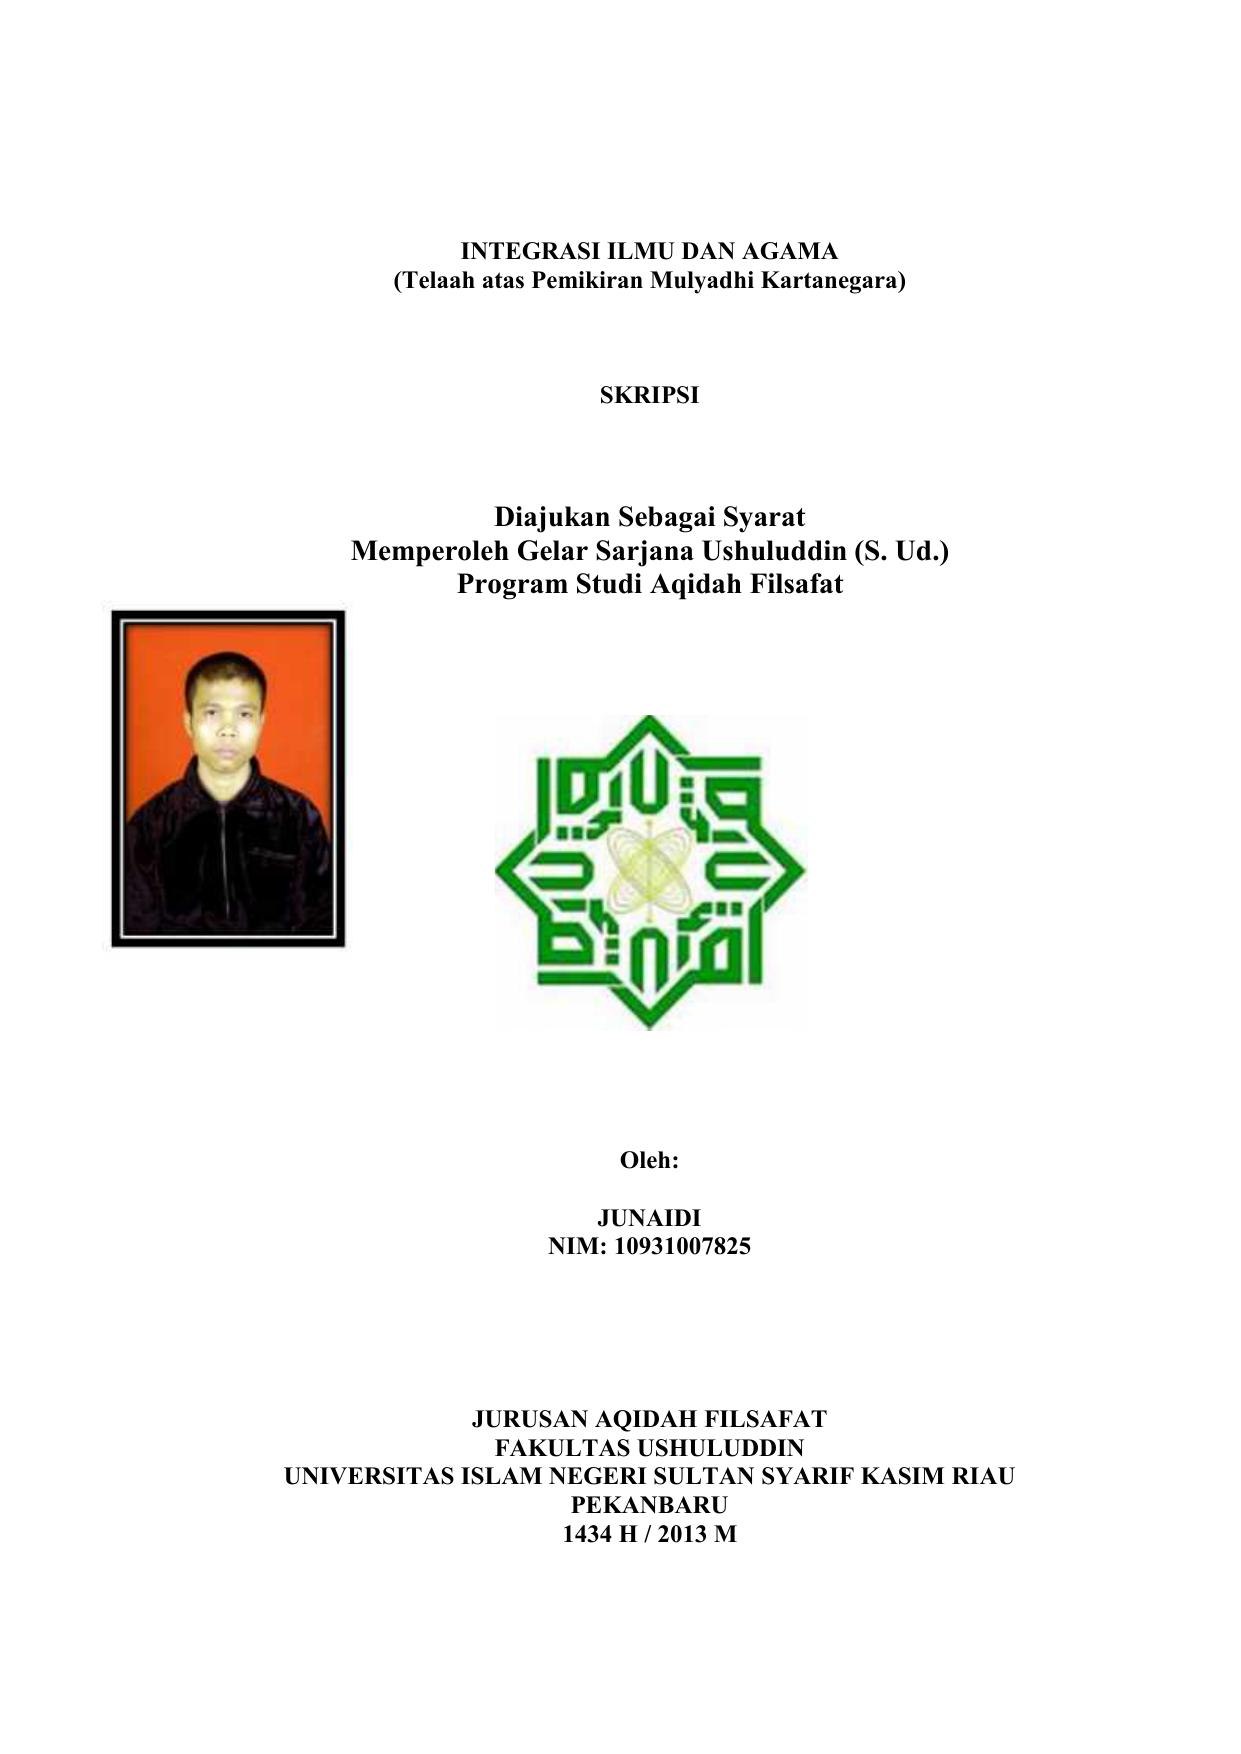 S Ud Program Studi Aqidah Filsafat